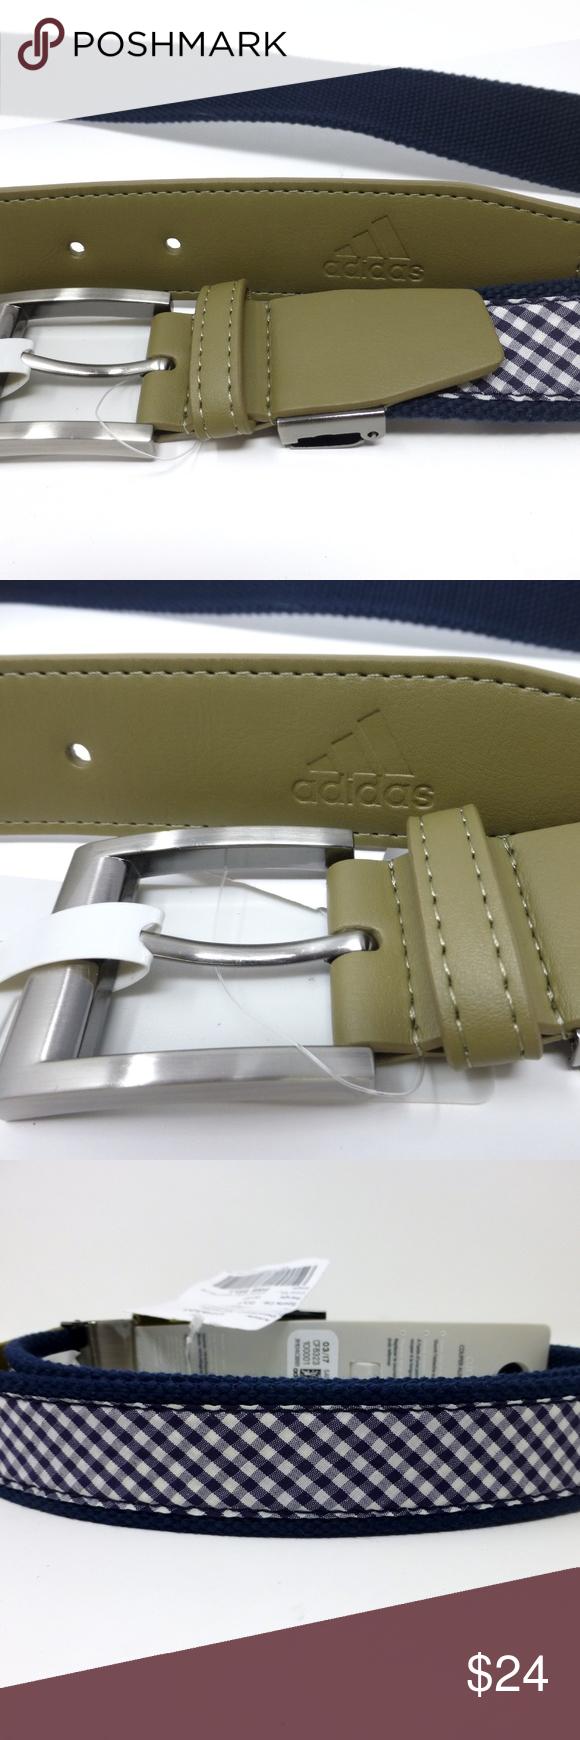 32++ Adidas golf belt cut to size ideas